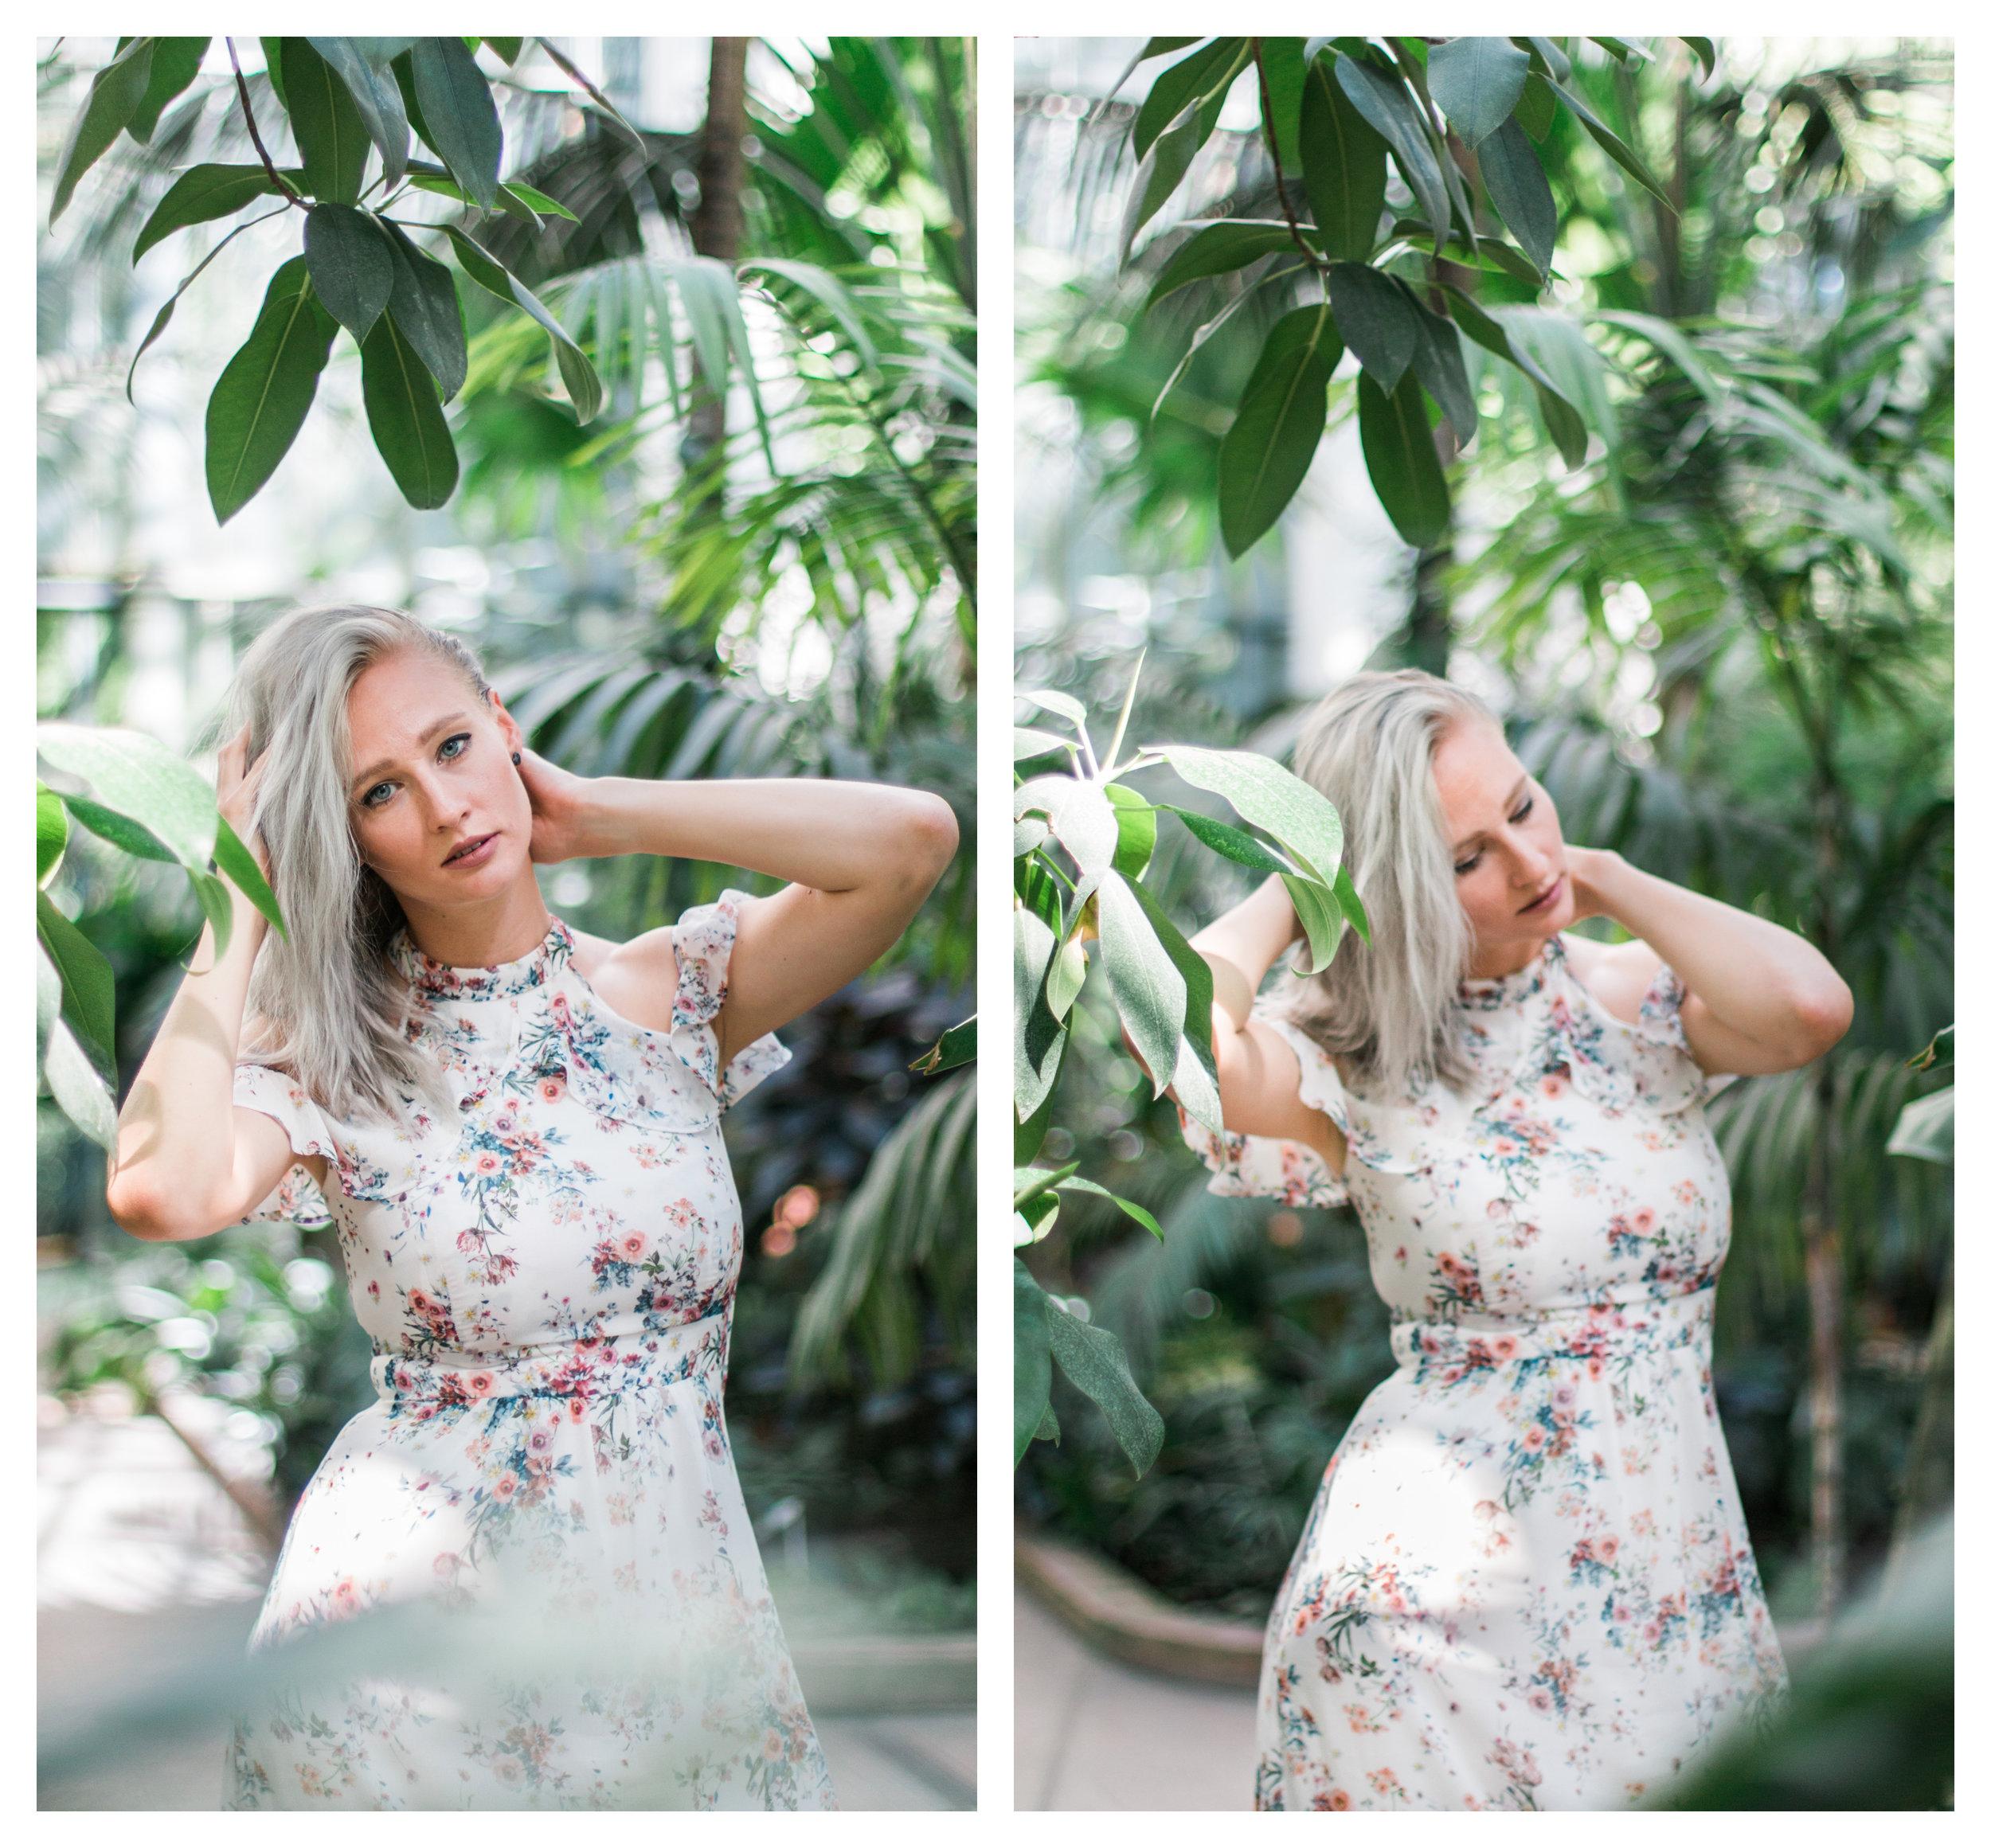 Wedding Photographer Iceland Bettina Vass